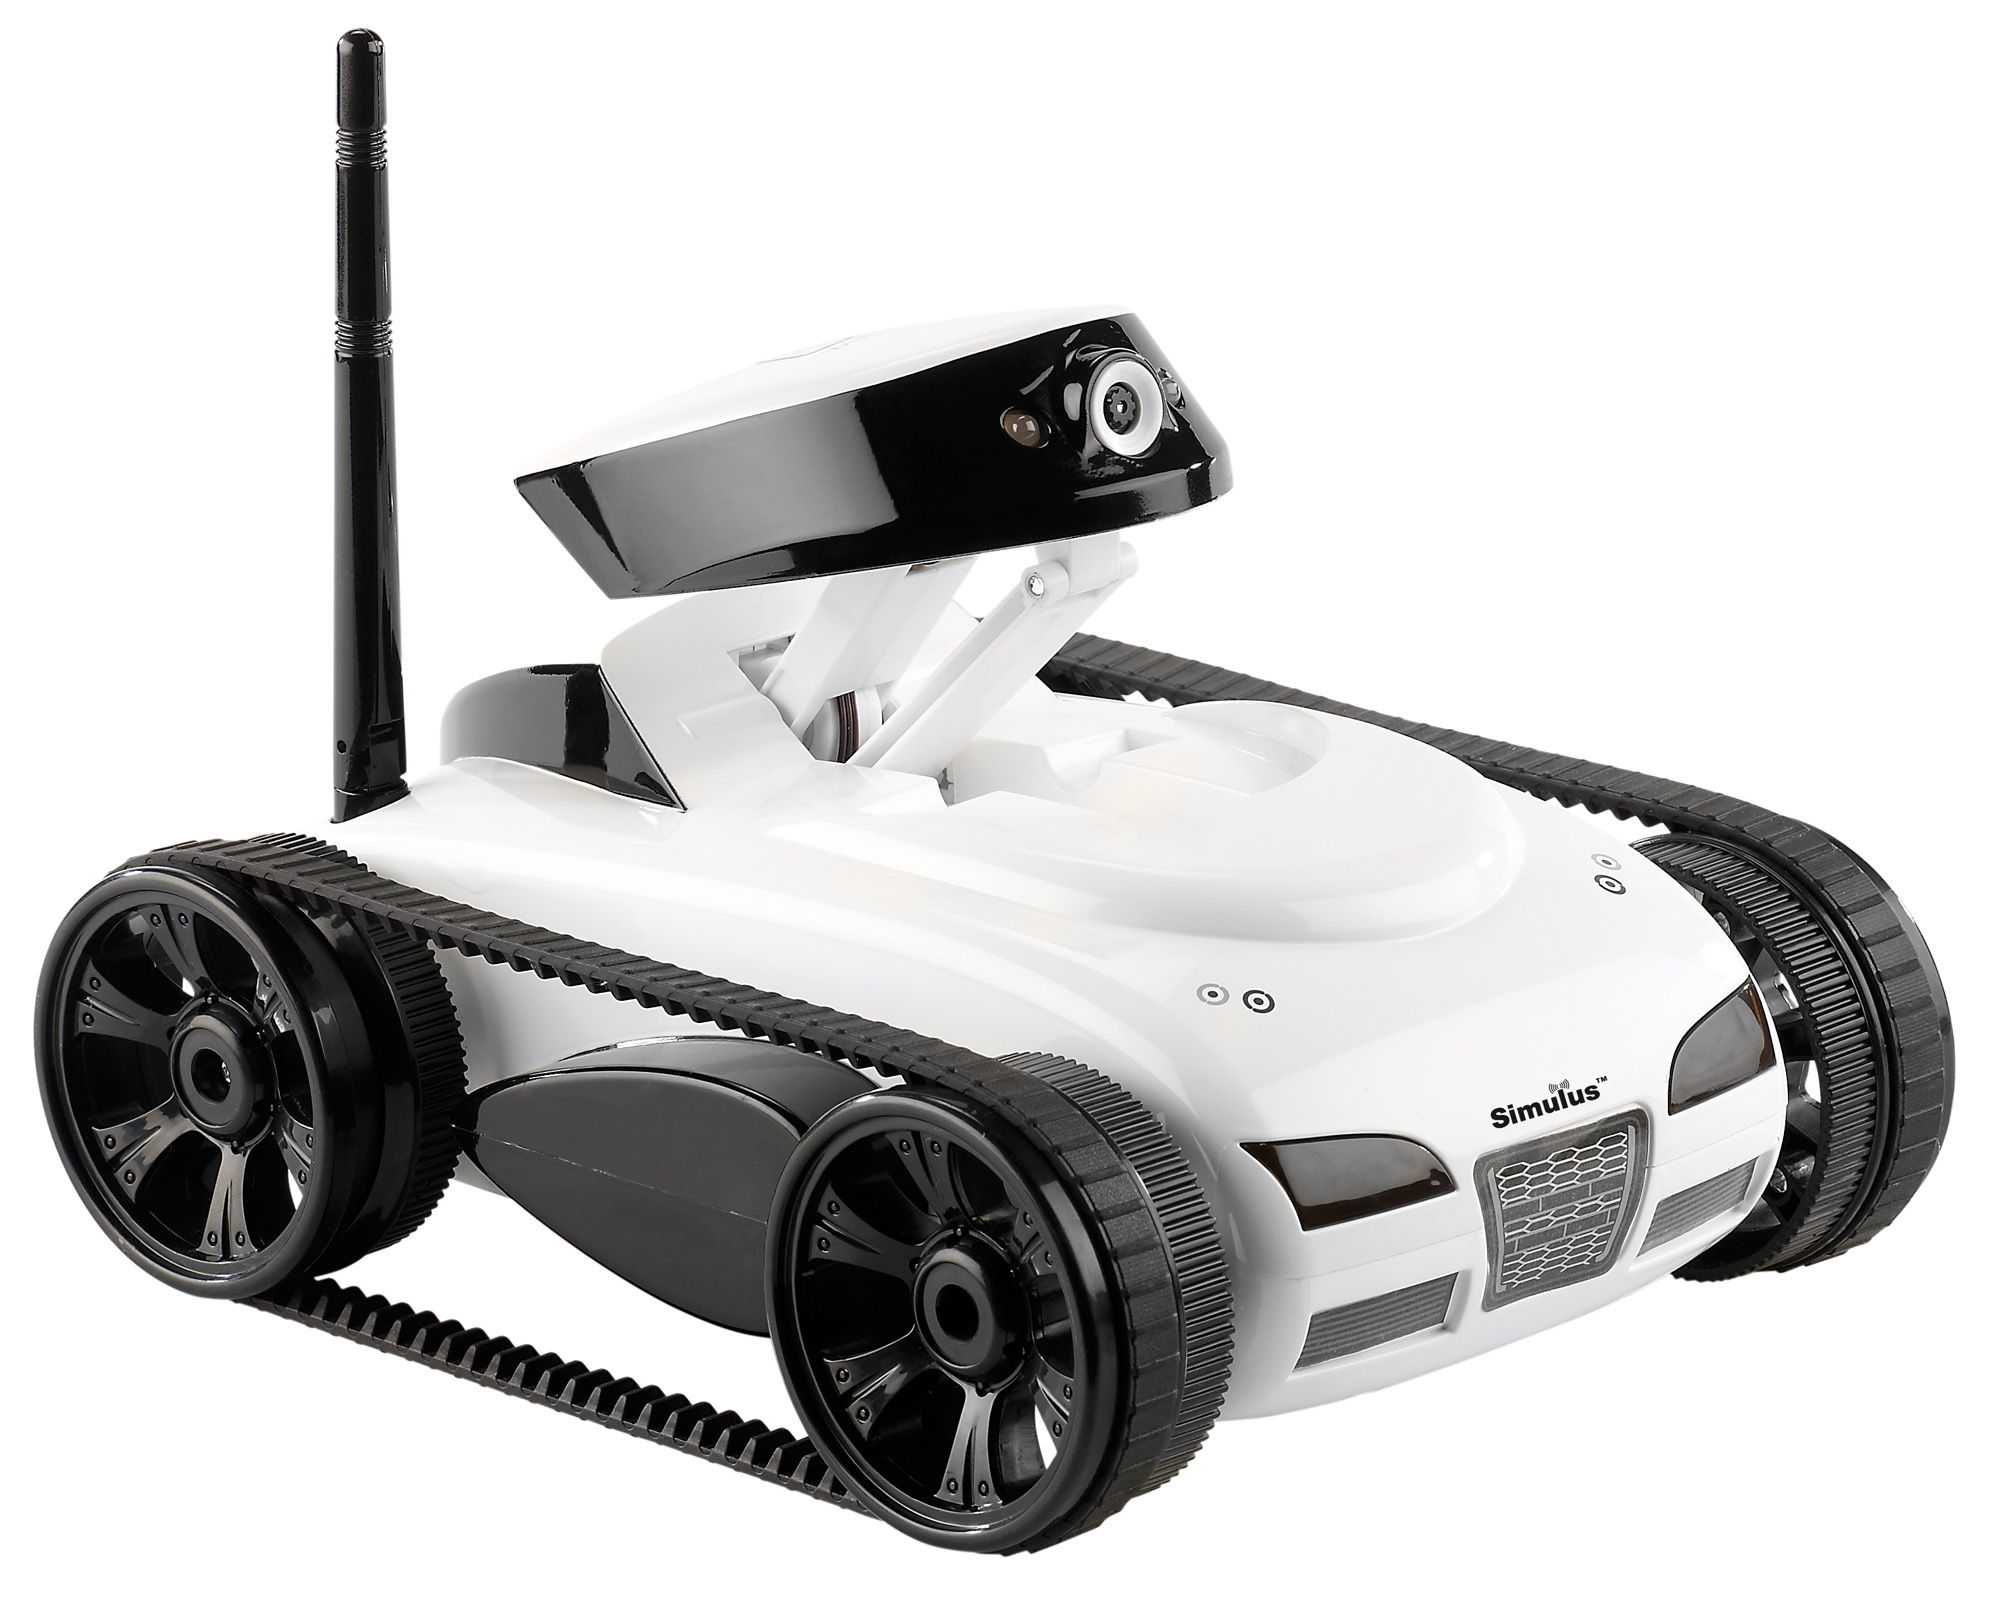 simulus wlan gesteuertes kamera auto wlc 240 wifi f r. Black Bedroom Furniture Sets. Home Design Ideas